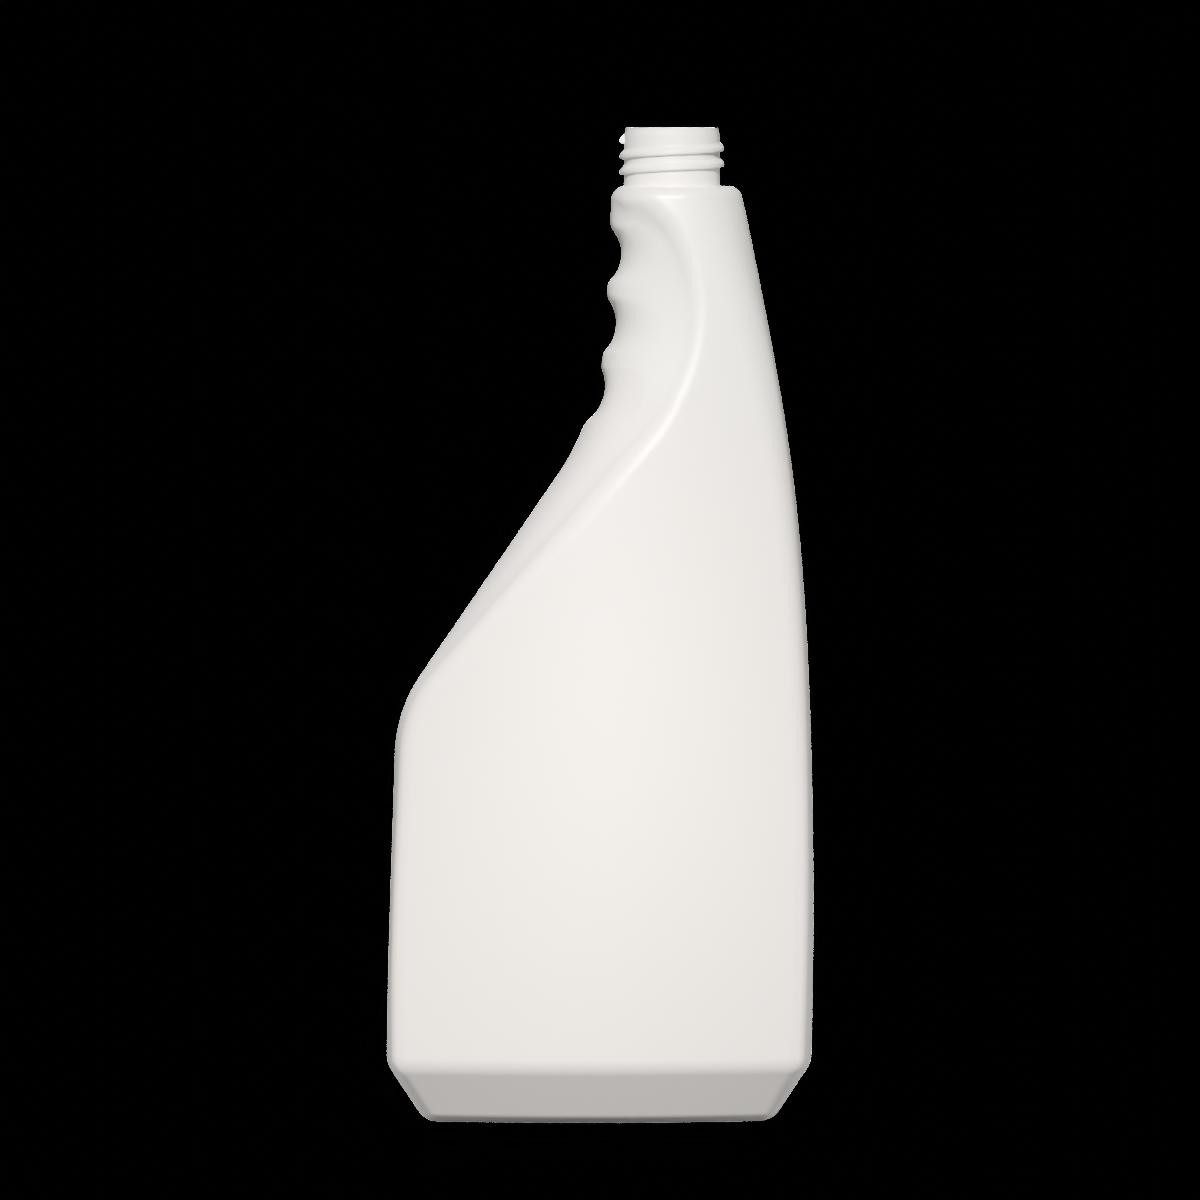 Sprayer 1 lt HDPE, collo 28/410, linea FLOREANA